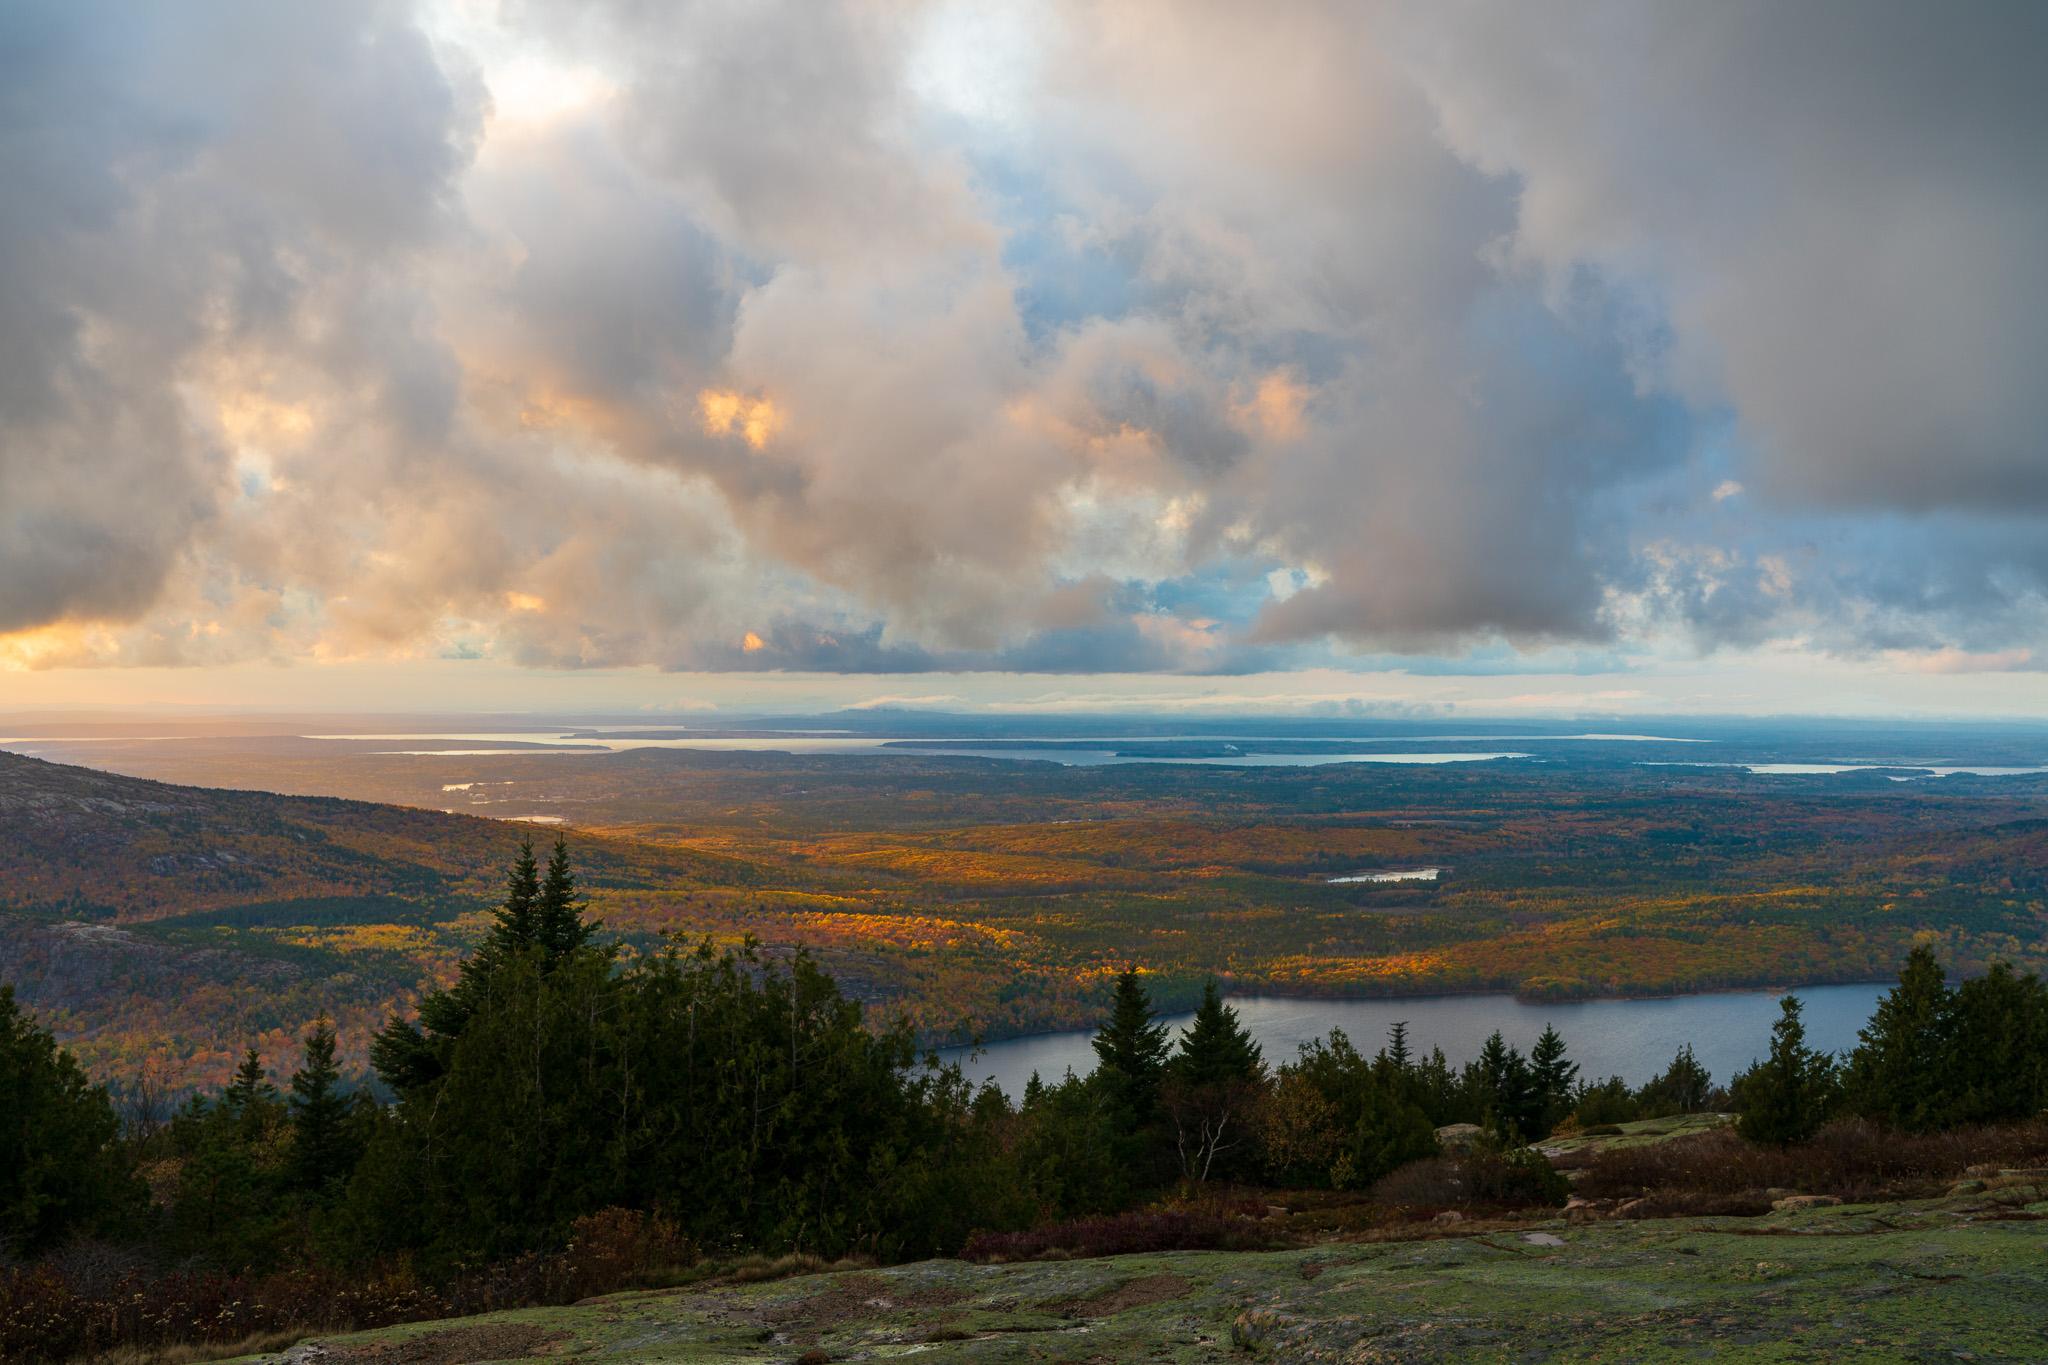 Blue Hiil Overlook, Acadia National Park